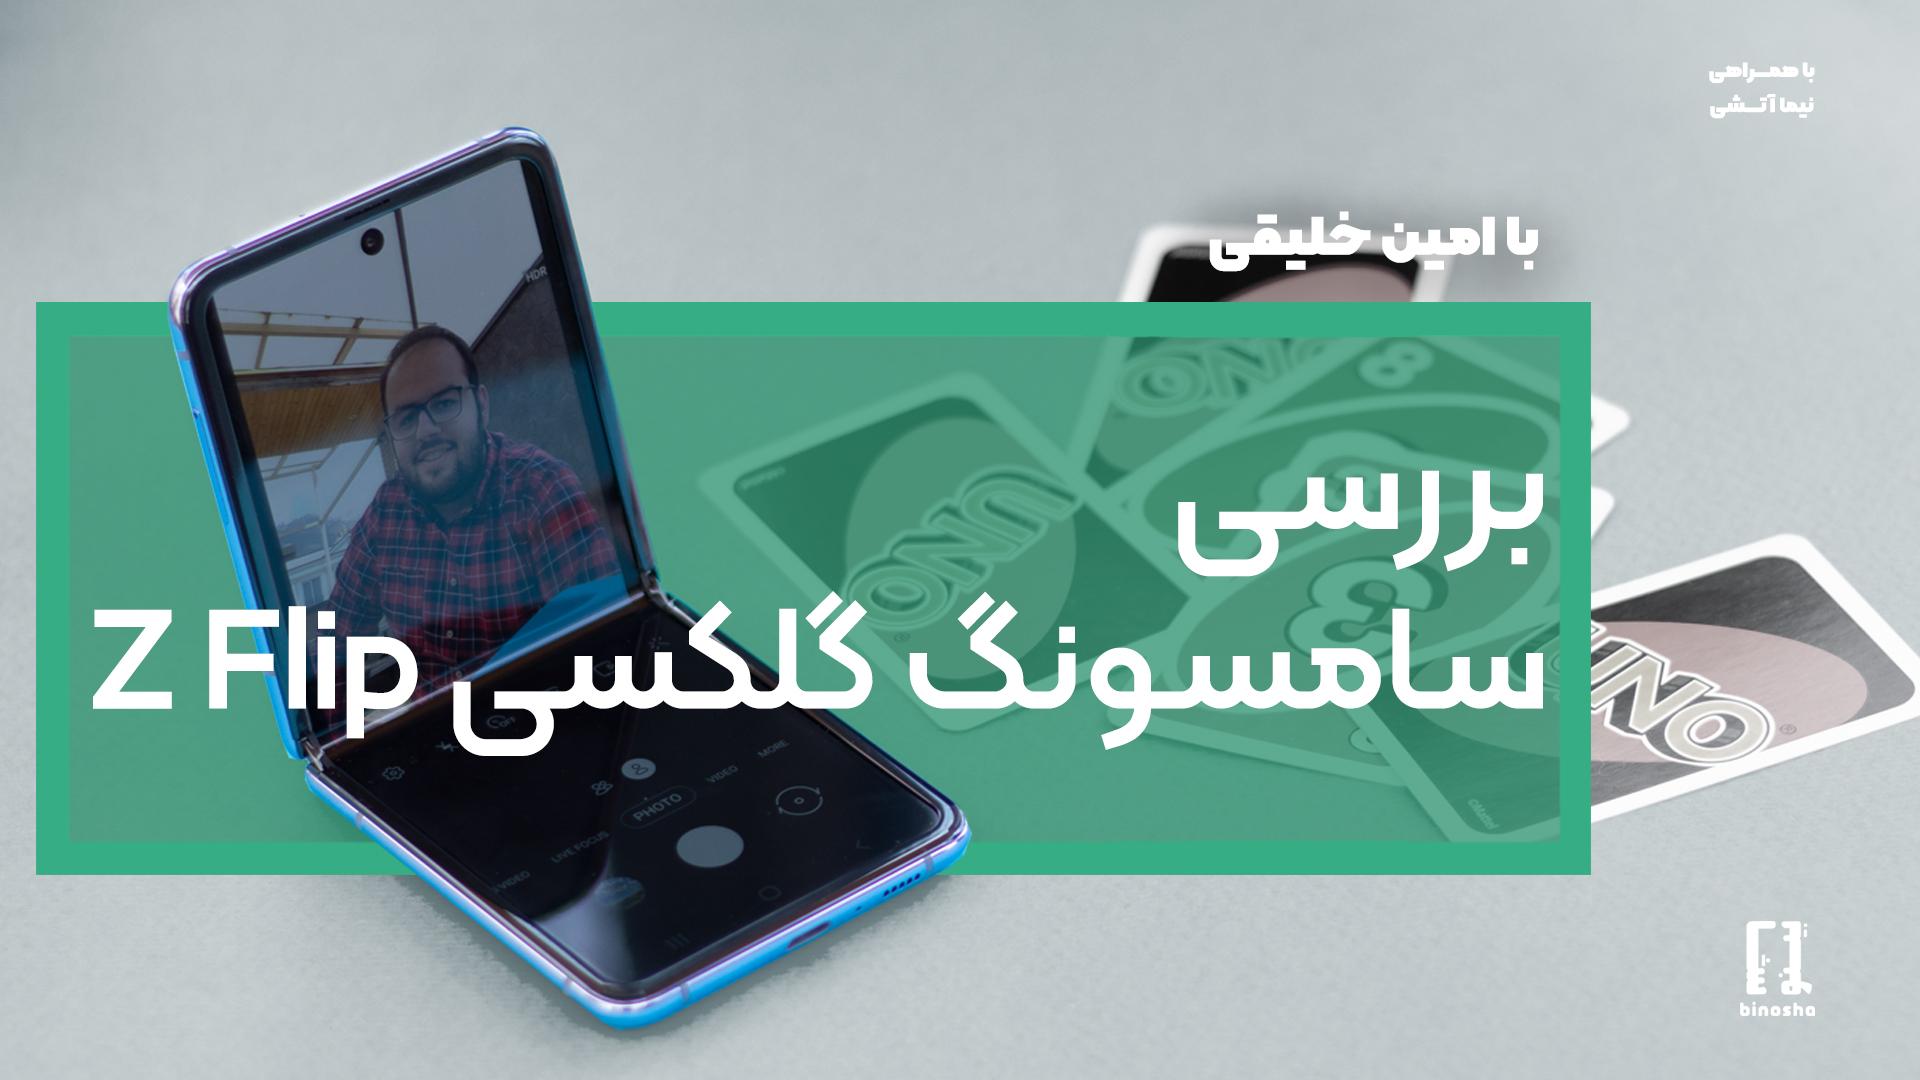 بررسی سامسونگ گلکسی زد فلیپ | Samsung Galaxy Z Flip Review